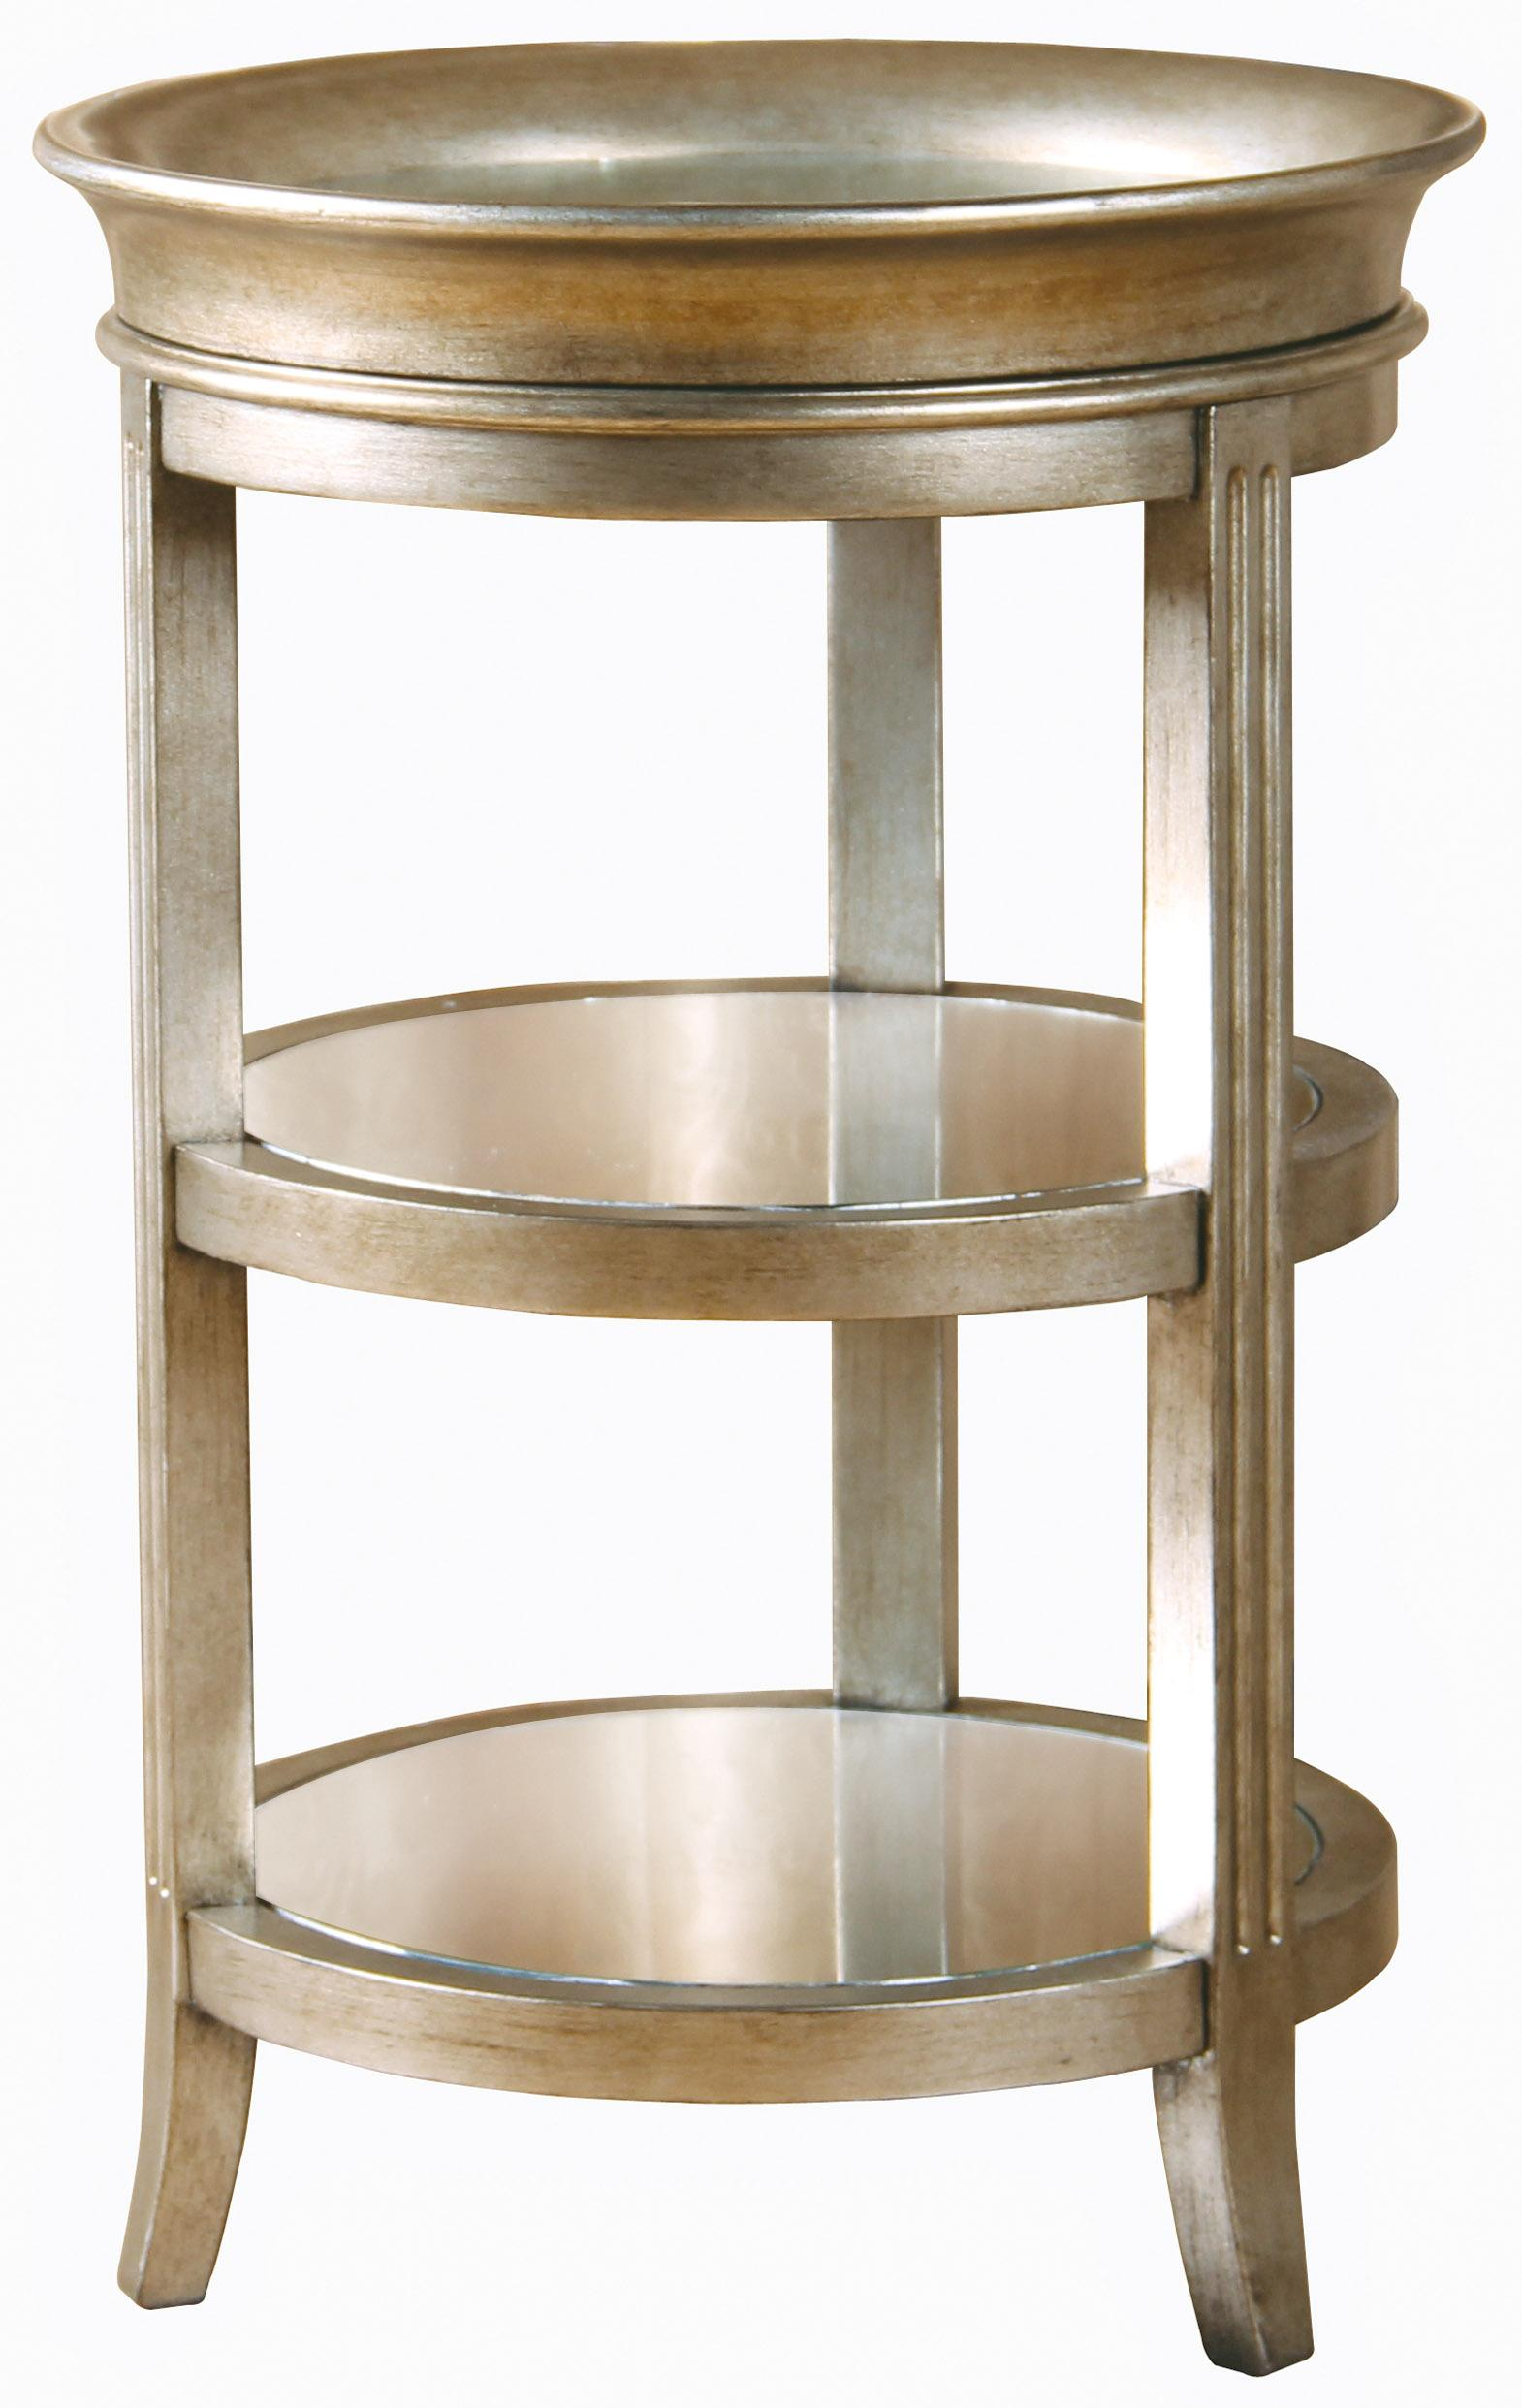 Pulaski Furniture Accents End Table - Item Number: 549066